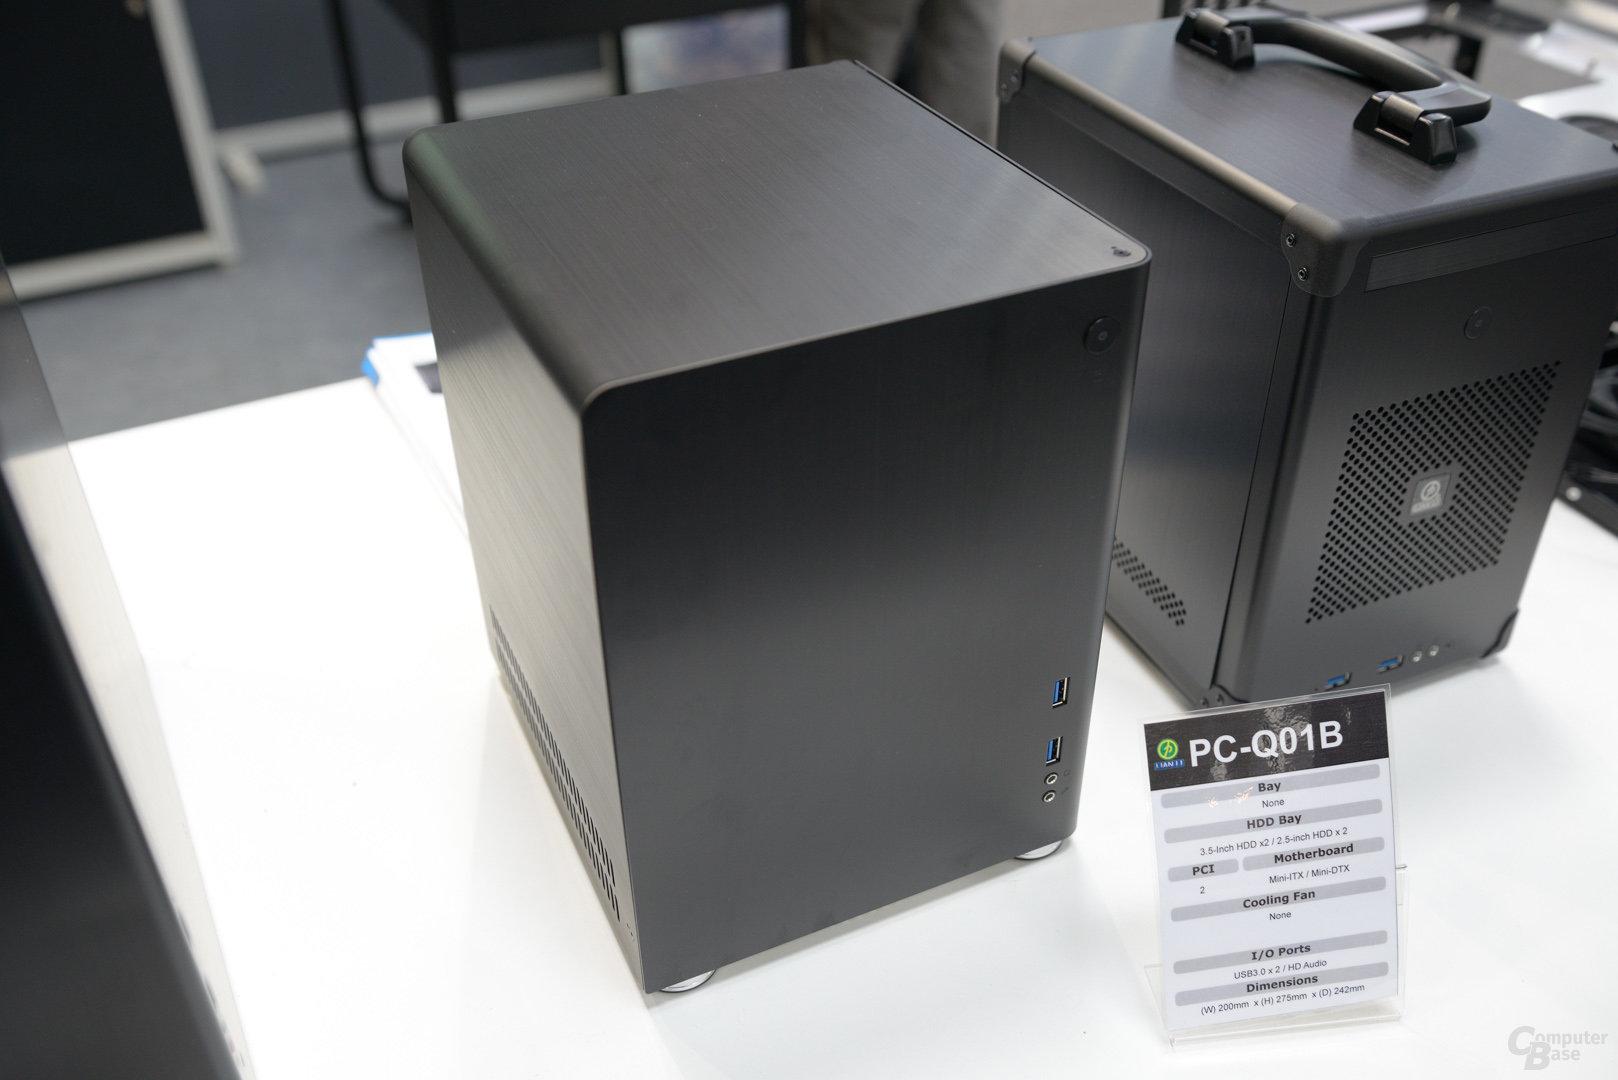 PC-Q01B